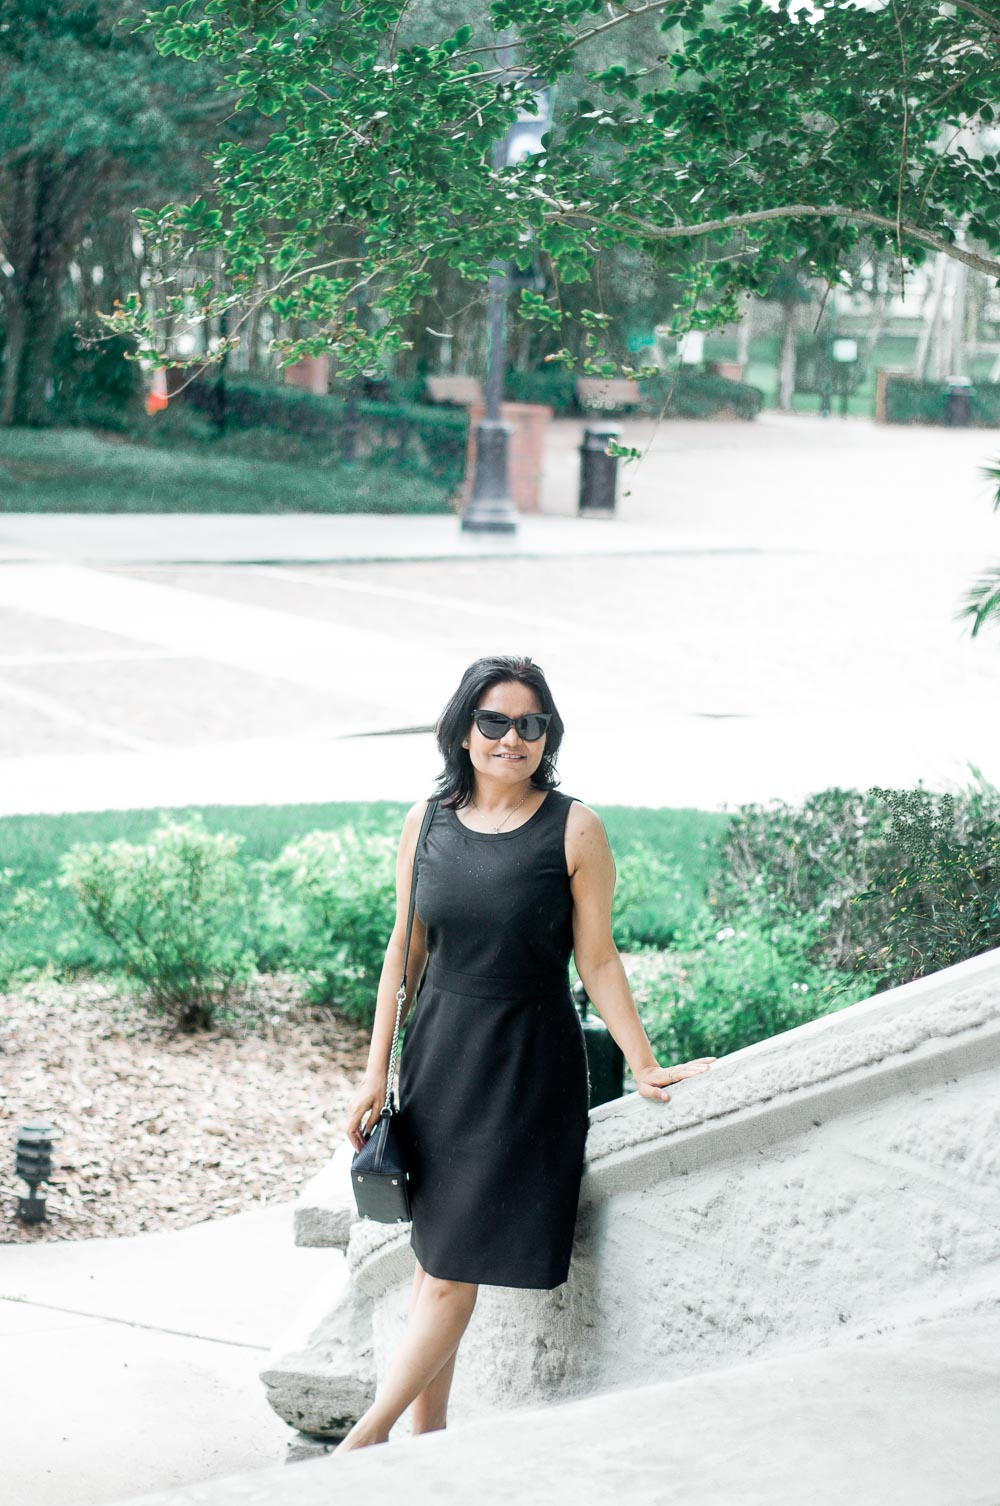 c93767027364 chic office wear j crew black dress with Furla top handle or Modalu